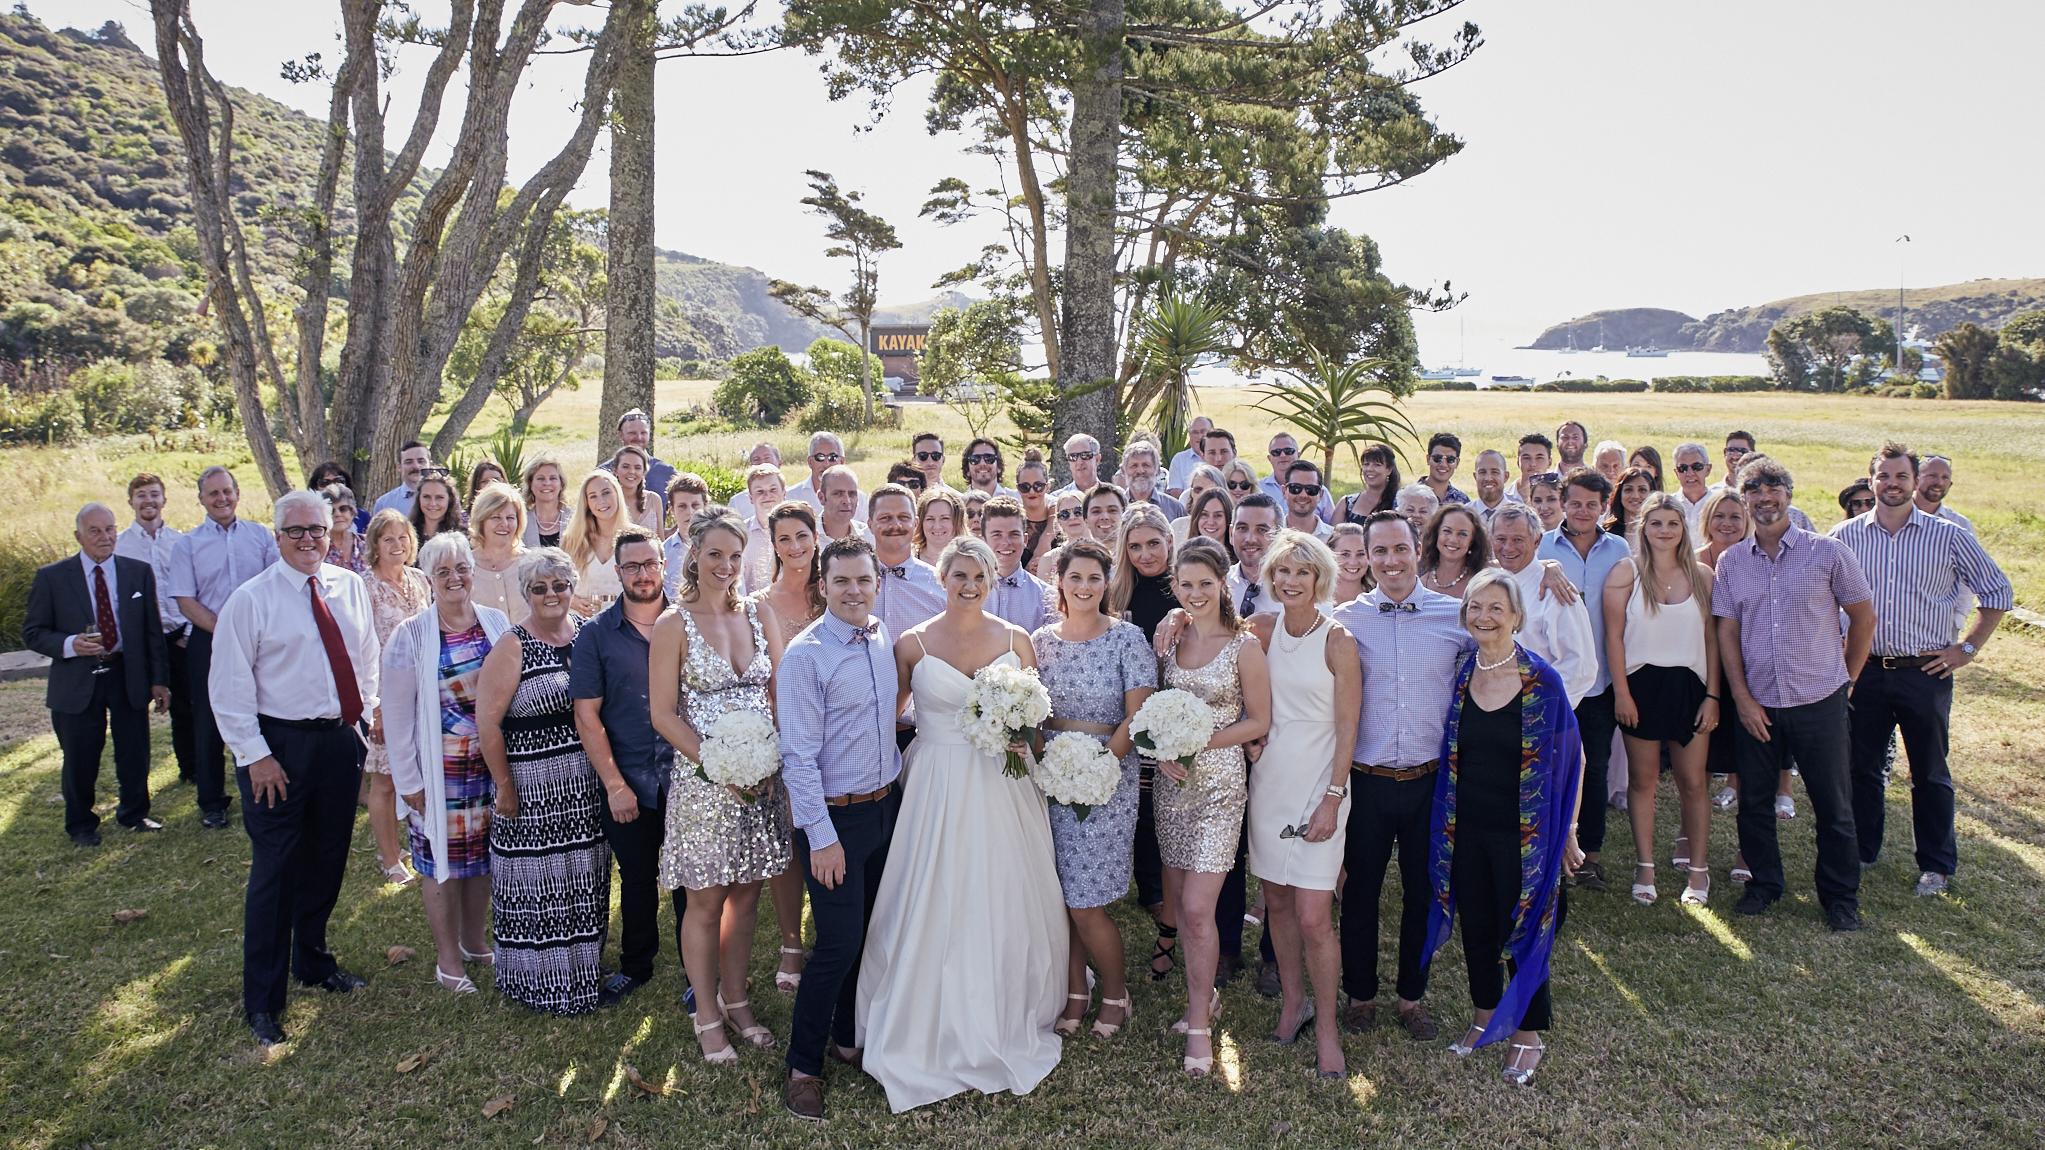 Wedding group photo outside